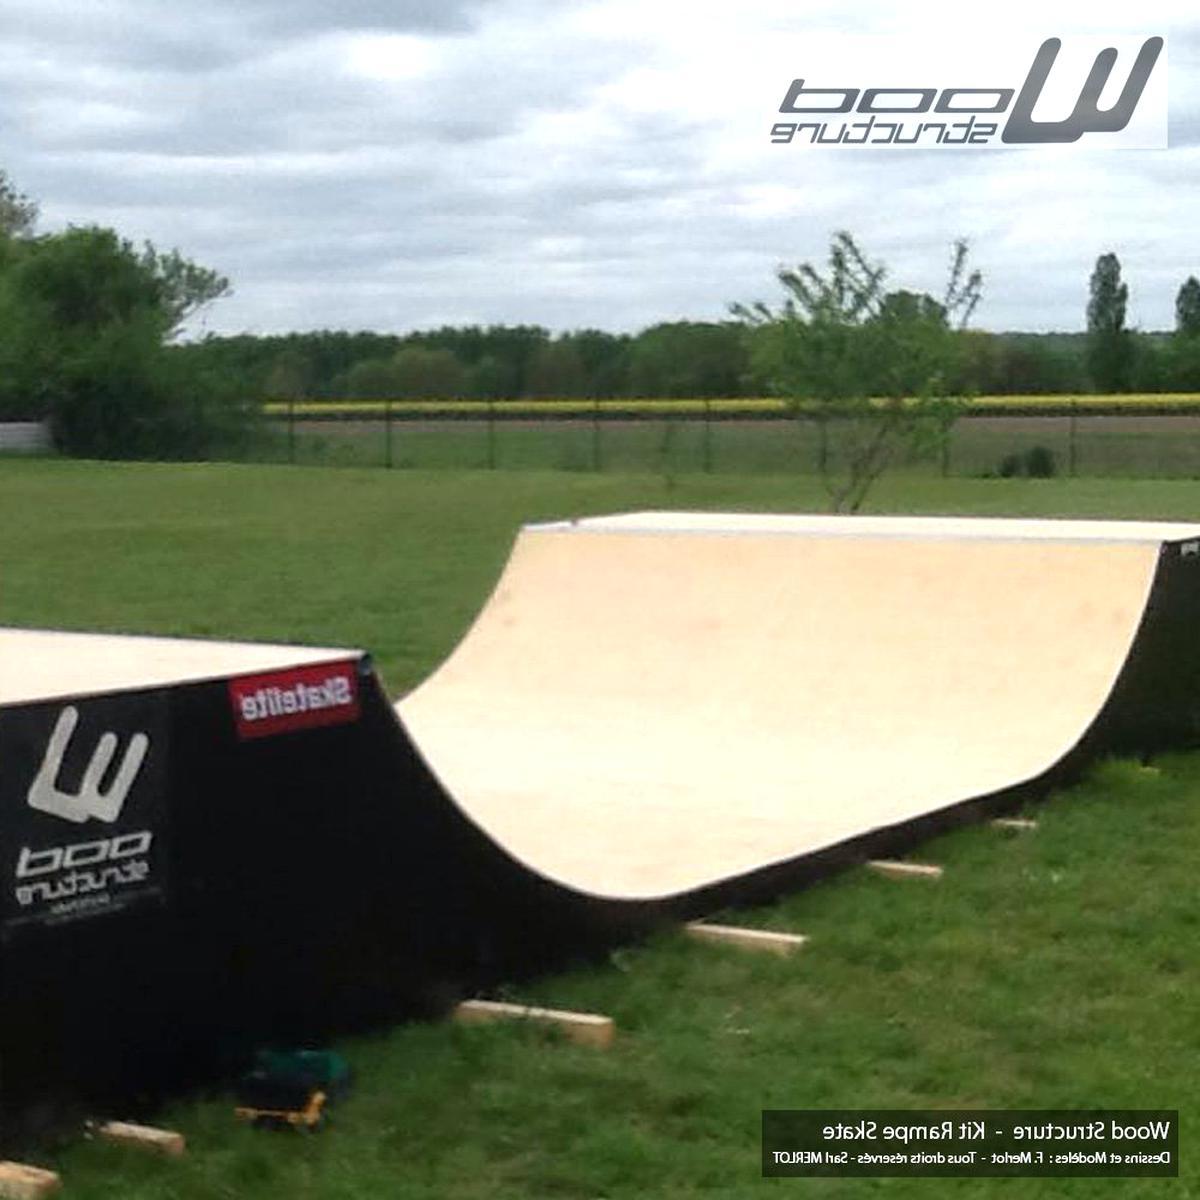 rampe skate park d'occasion